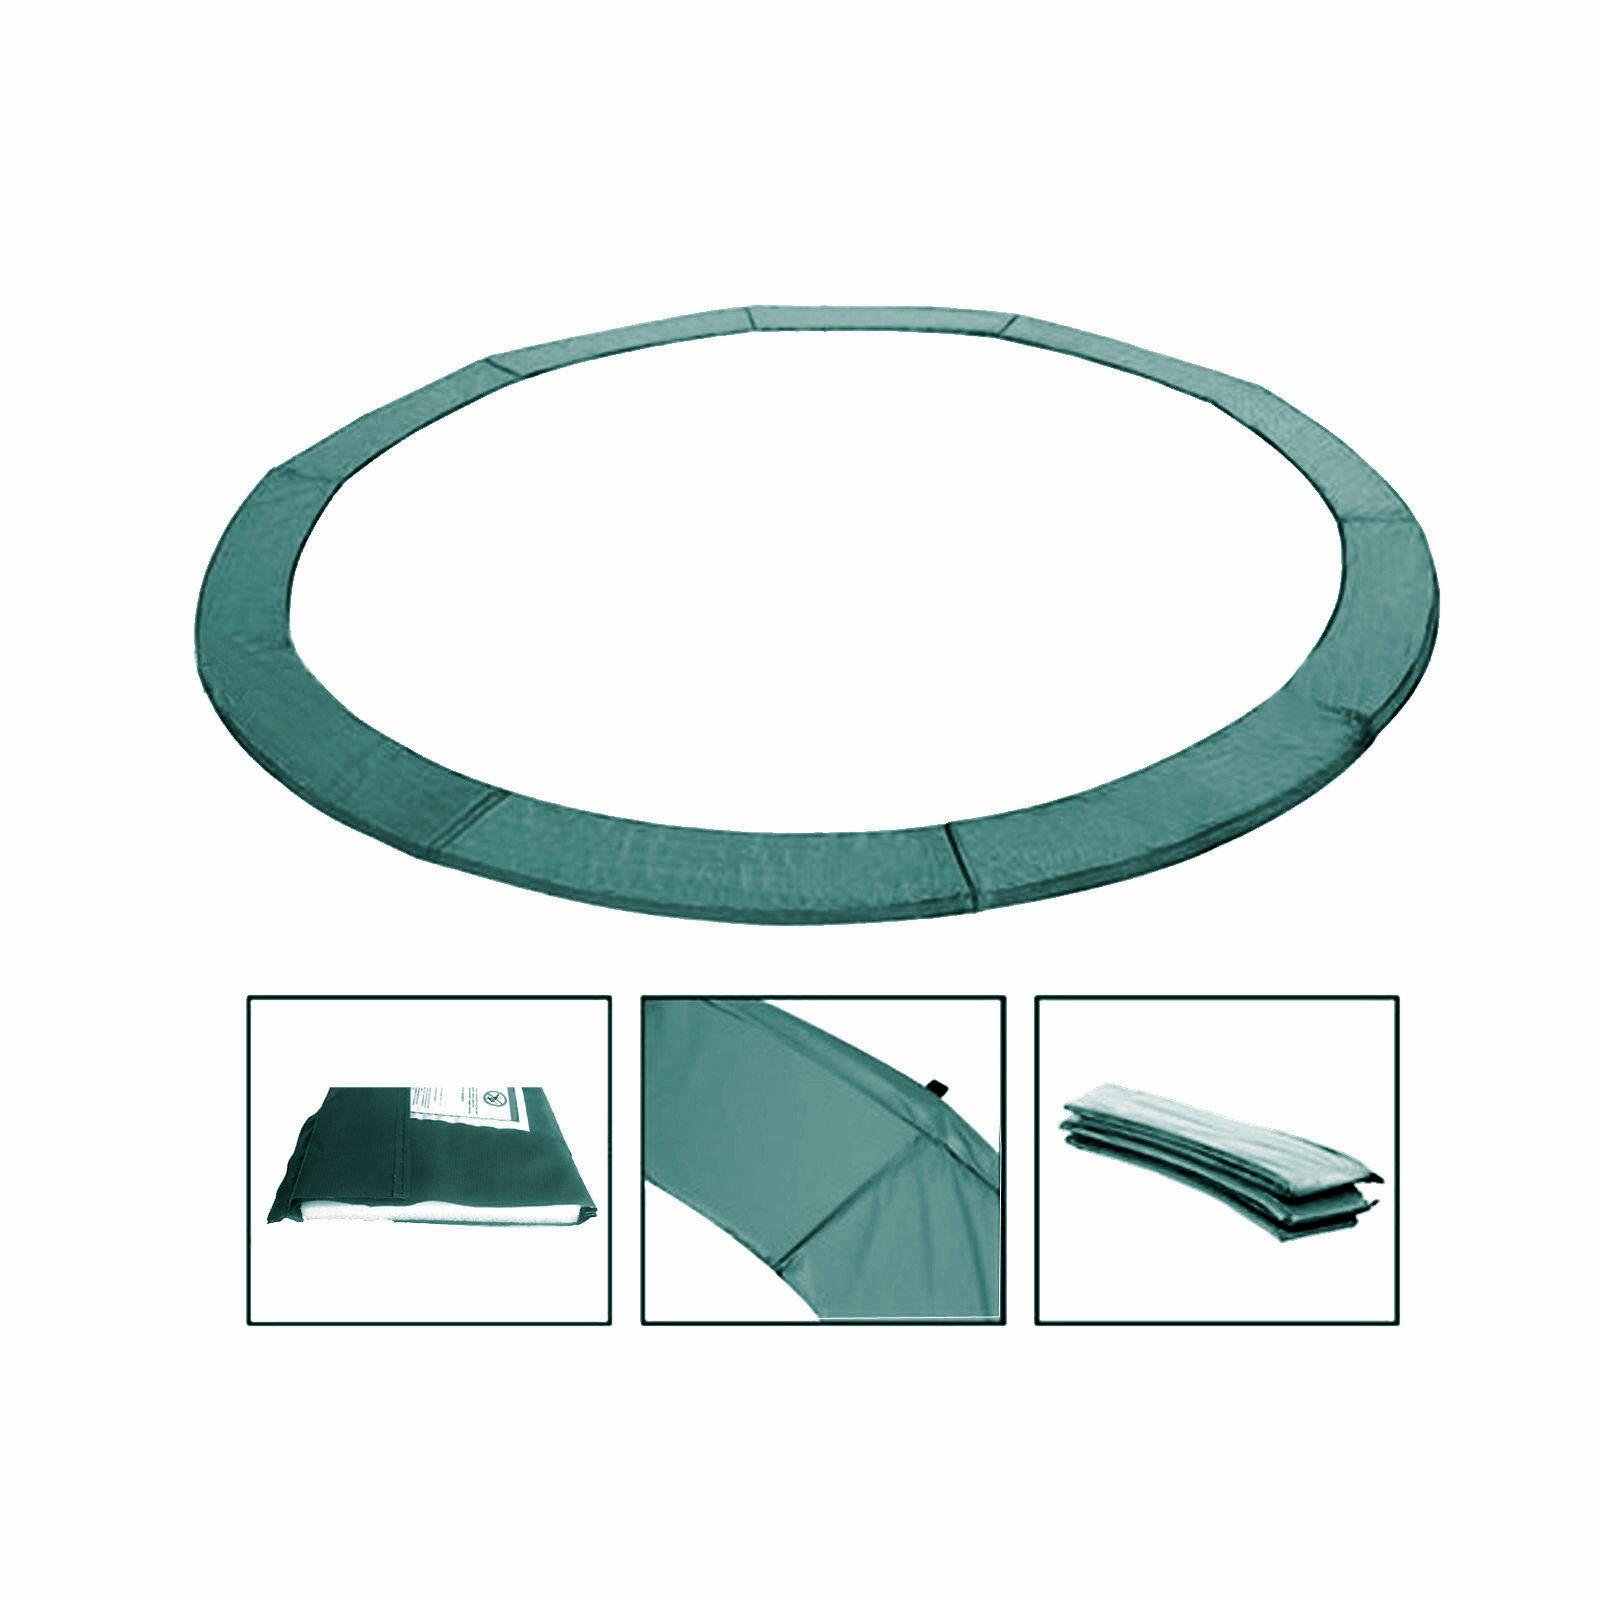 Trampoline Spring Cover 300 - 305 cm Green Edge Cover Edge Predection Cover